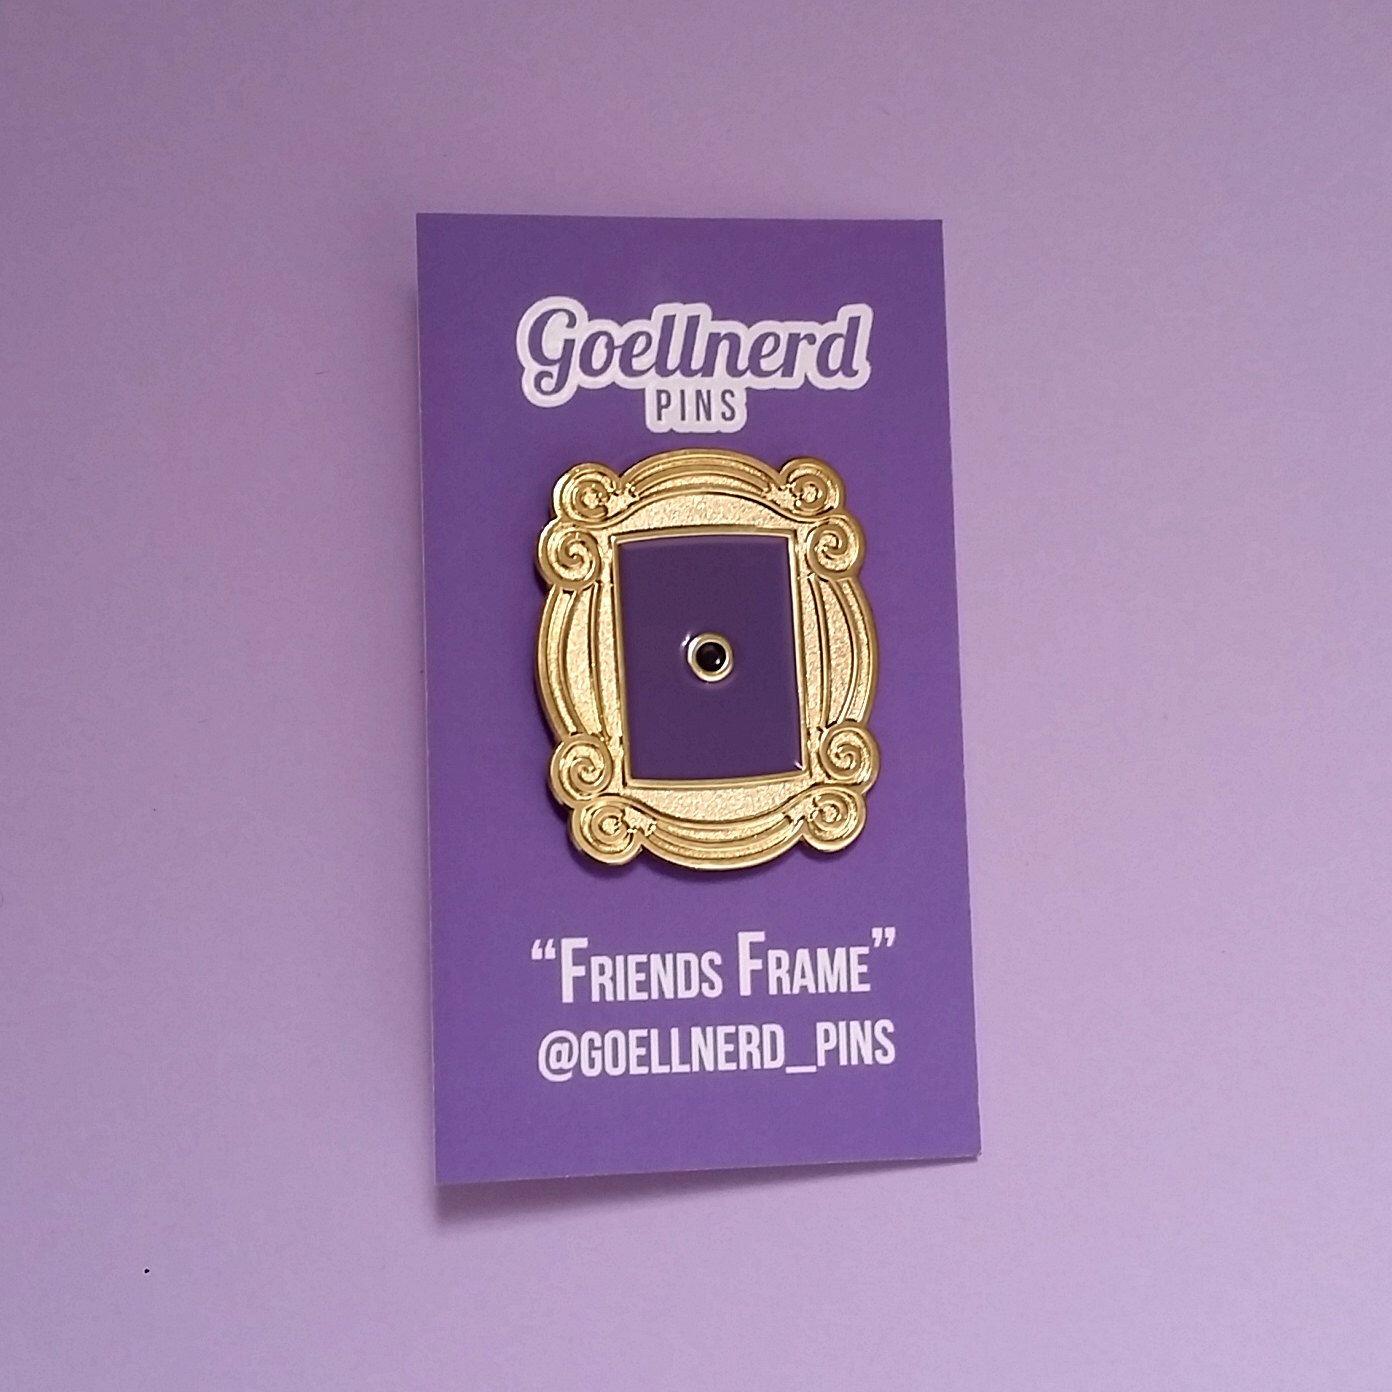 Friends Frame Pin Soft Enamel 90s TV Show Gifts Gift | Pinterest